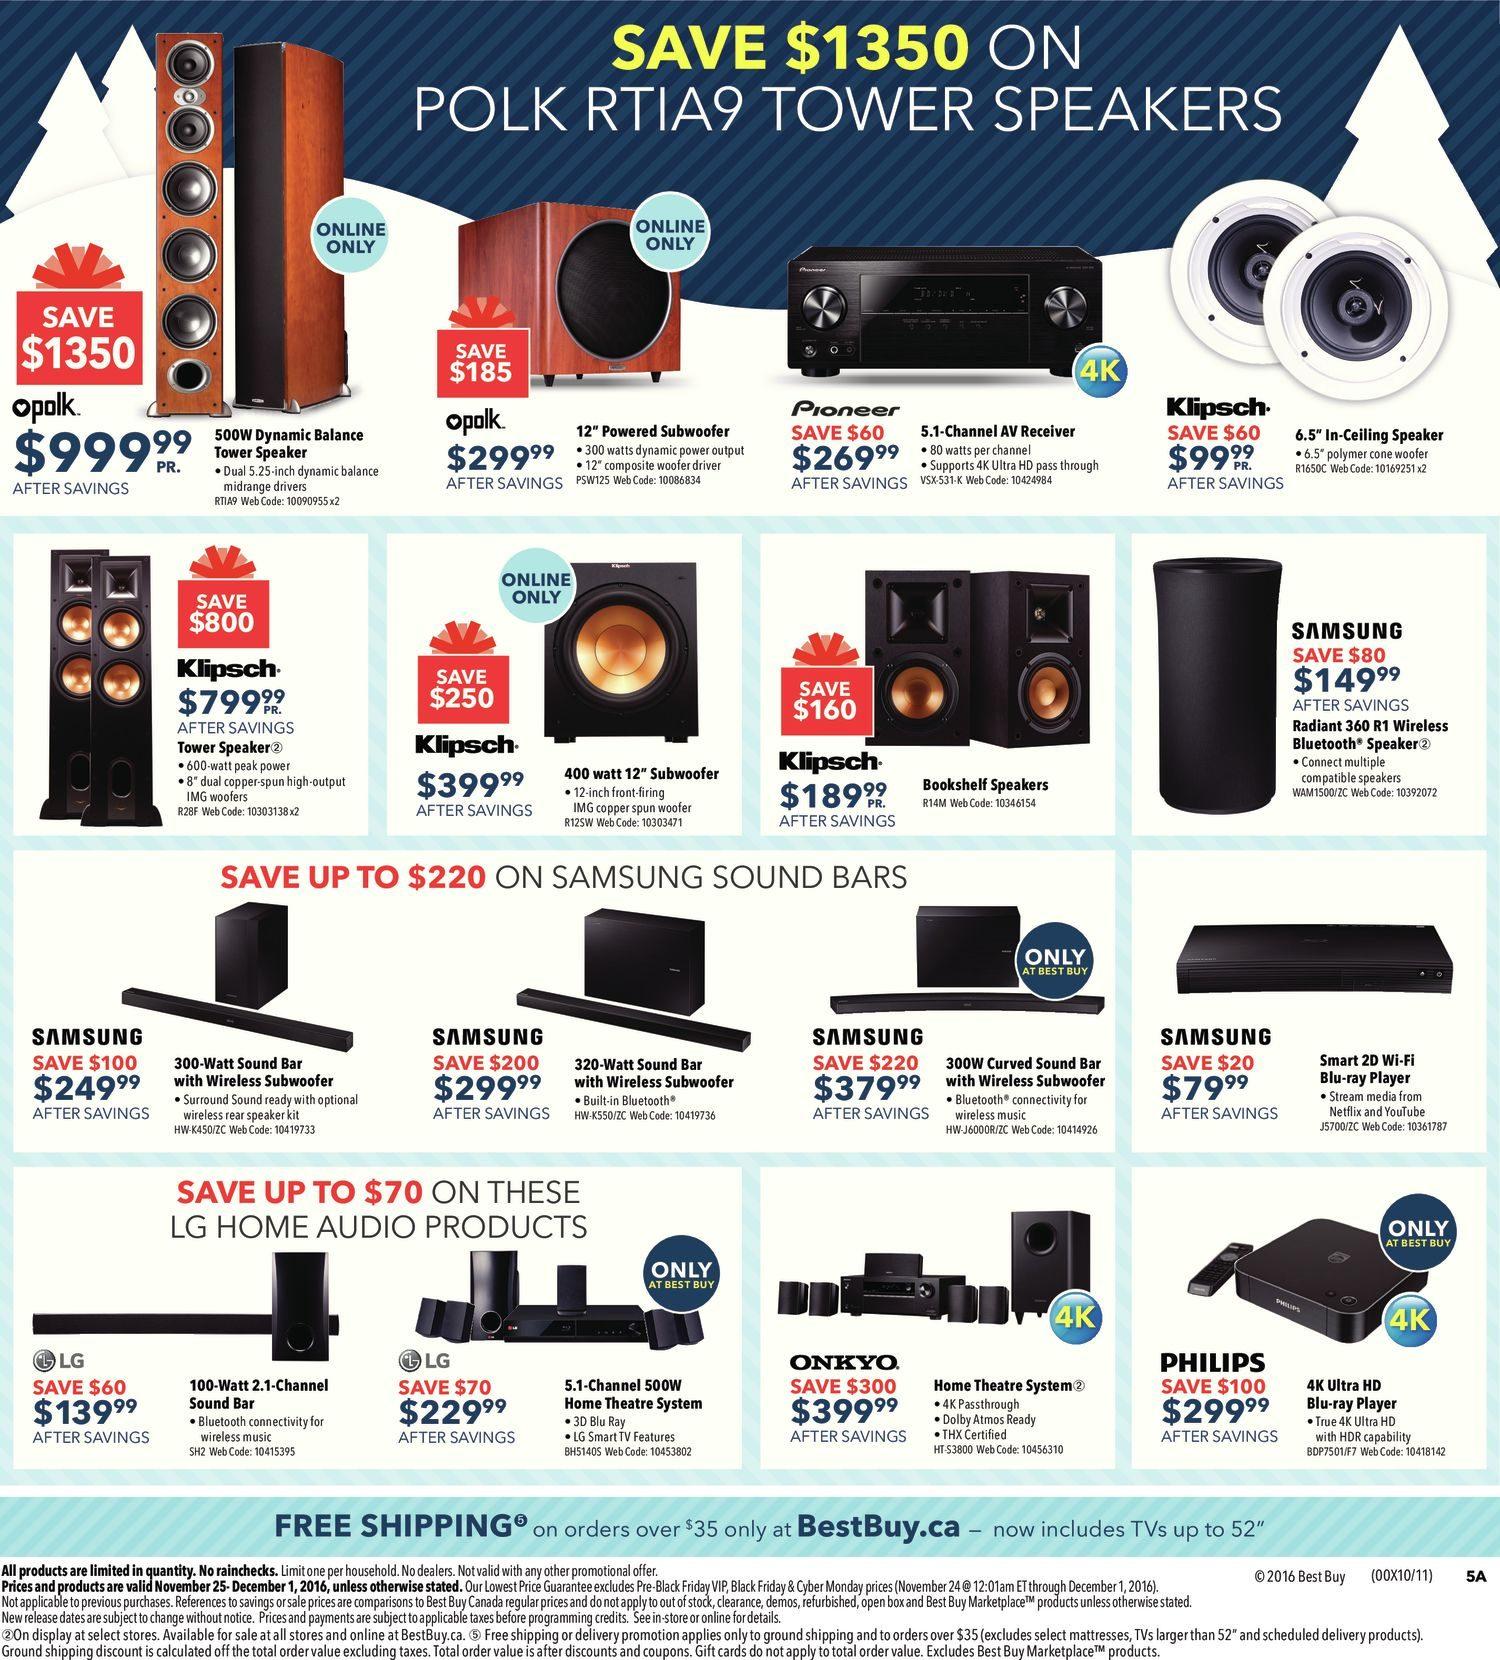 de8b381d68a Best Buy Weekly Flyer - Weekly - Black Friday Sale - Nov 25 – Dec 1 -  RedFlagDeals.com